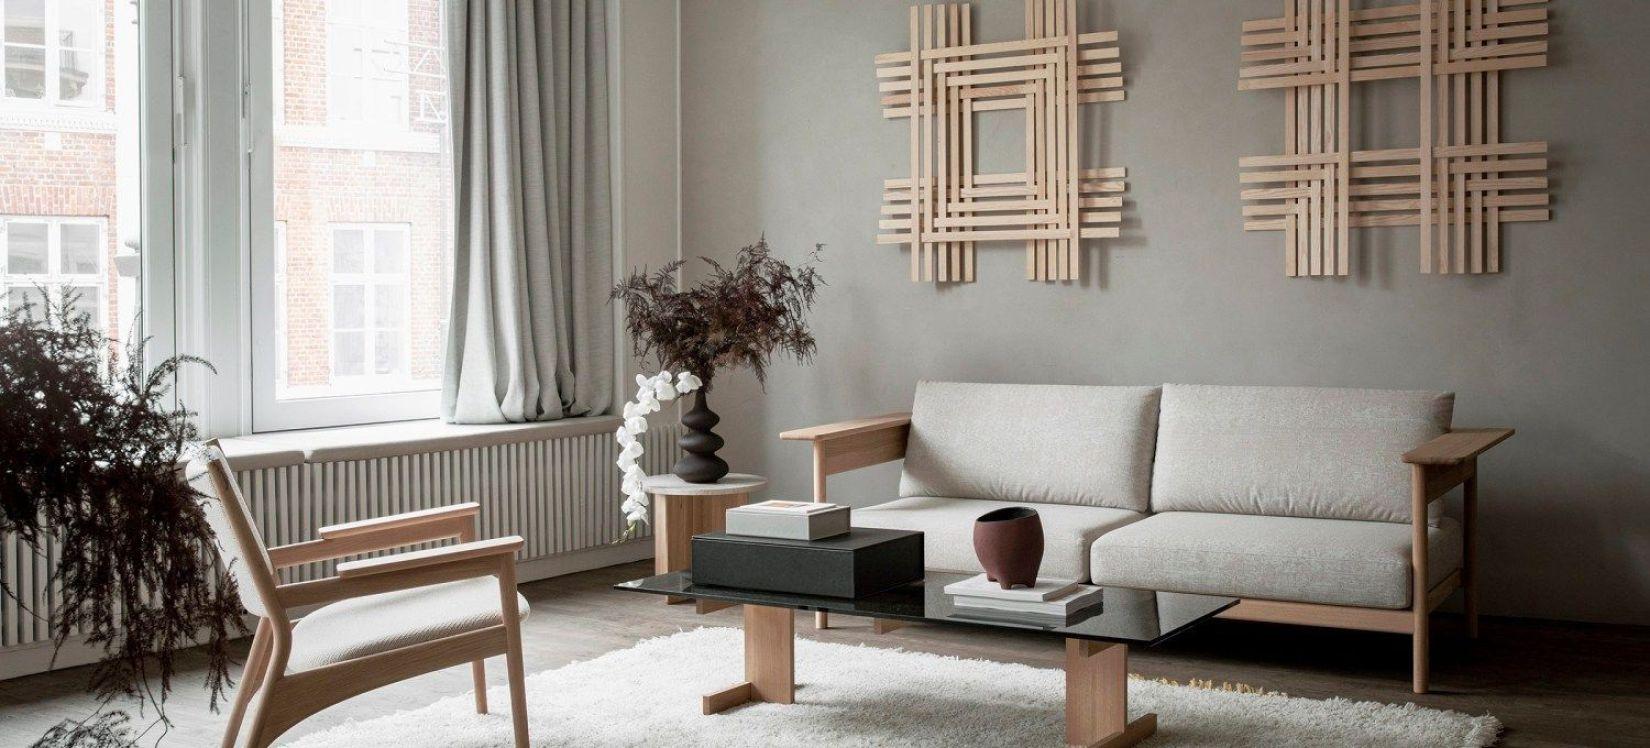 Karimoku Case Study, salón de estilo japandi en tonos neutros evocan la tranquilidad y la calma, tendencias diseño e interiorismo 2020 @Utrillanais